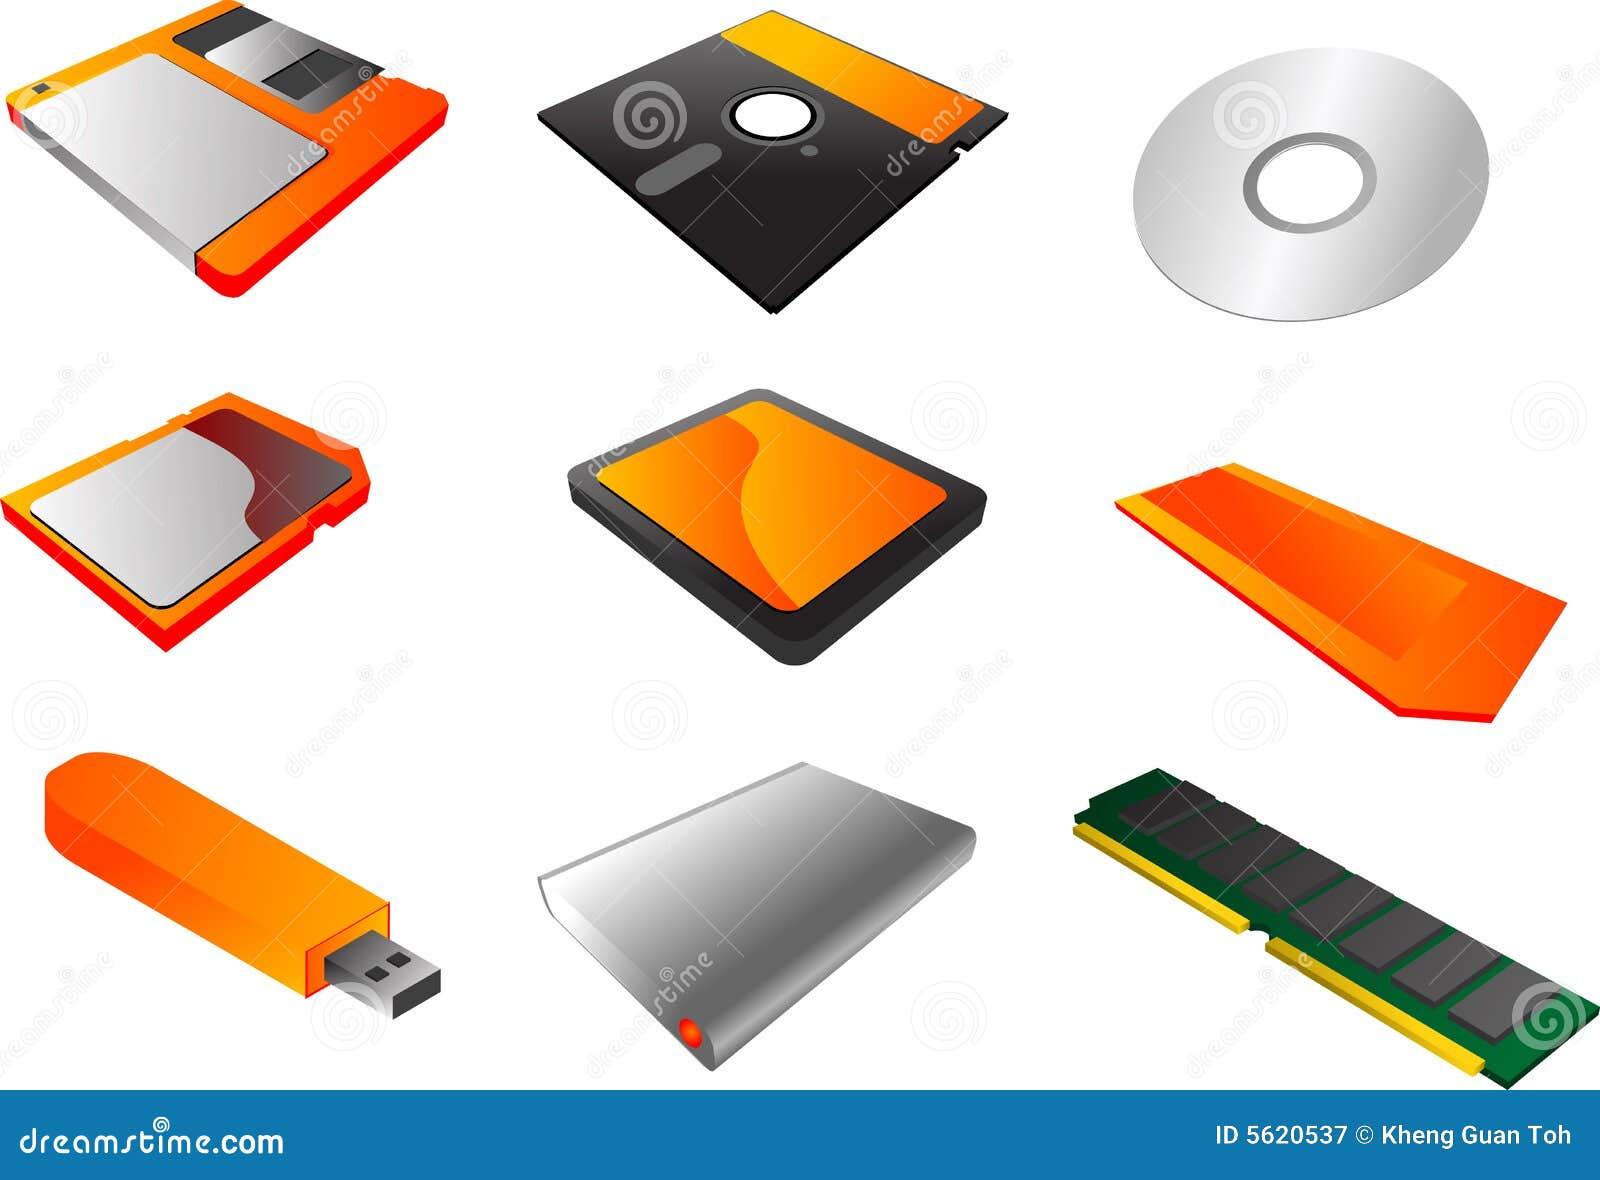 Storage media clipart